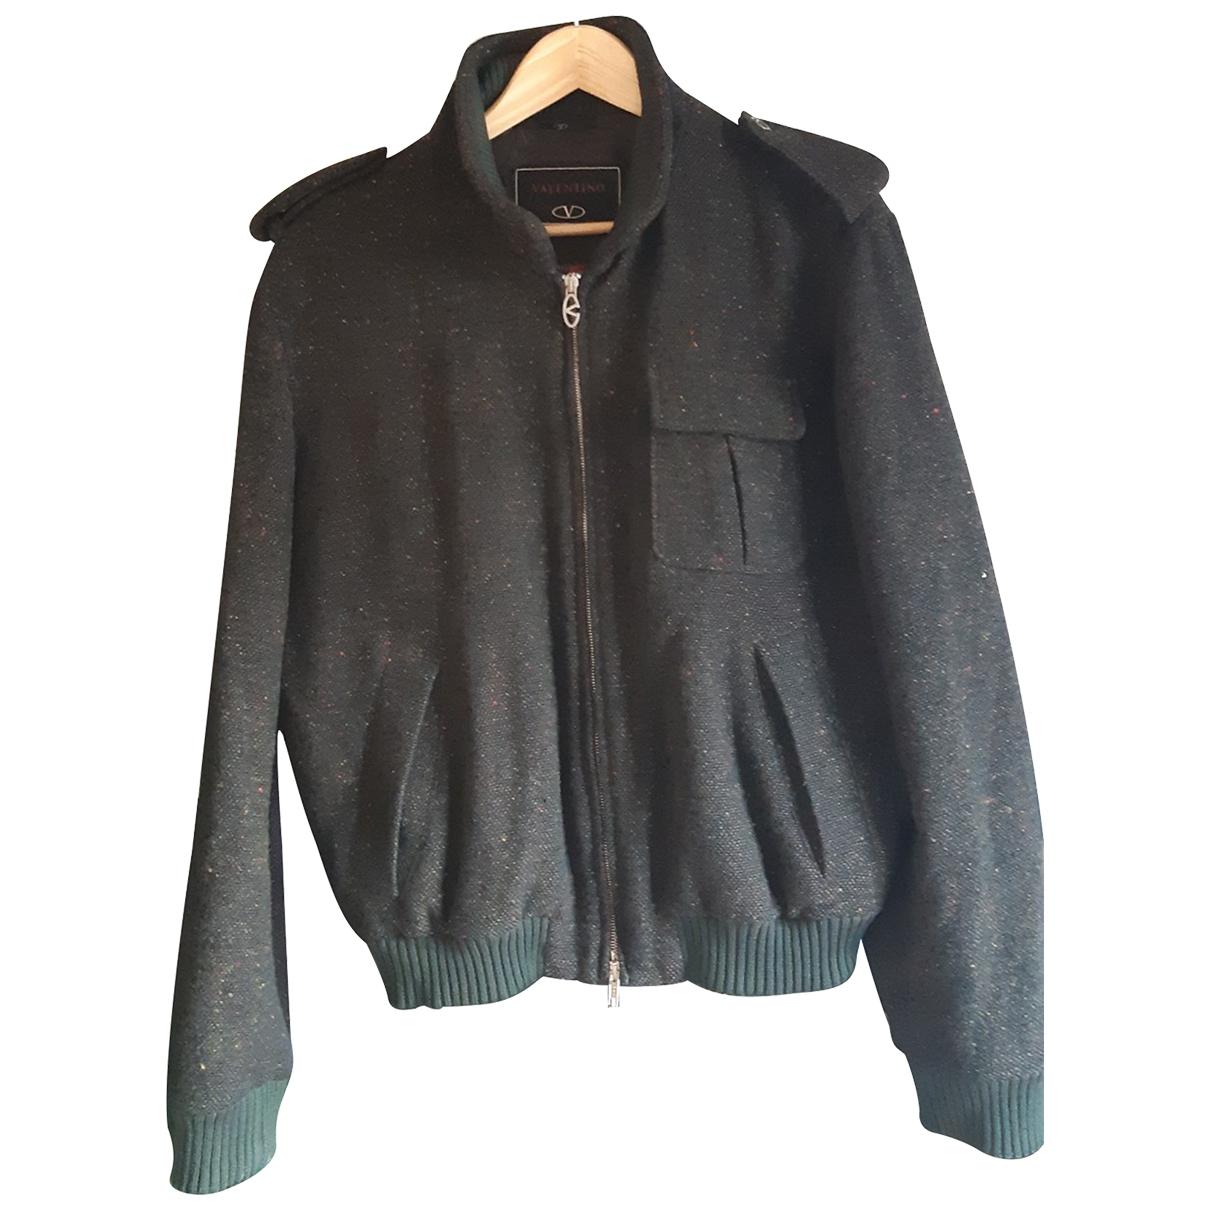 Valentino Garavani \N Brown Wool jacket  for Men M International